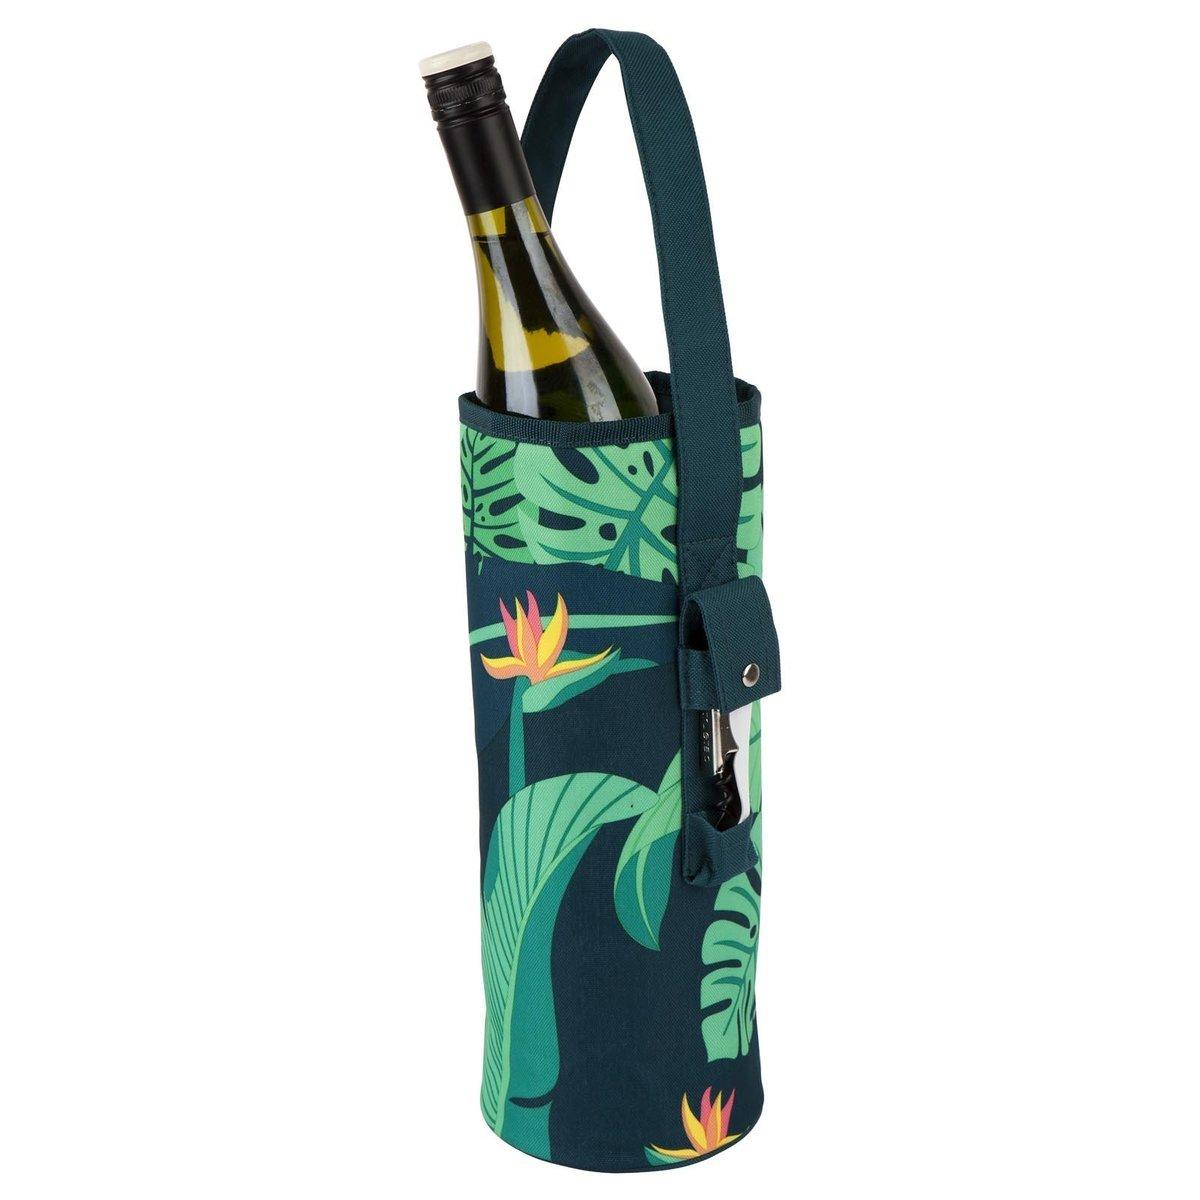 Sunnylife Cooler Bottle Totes